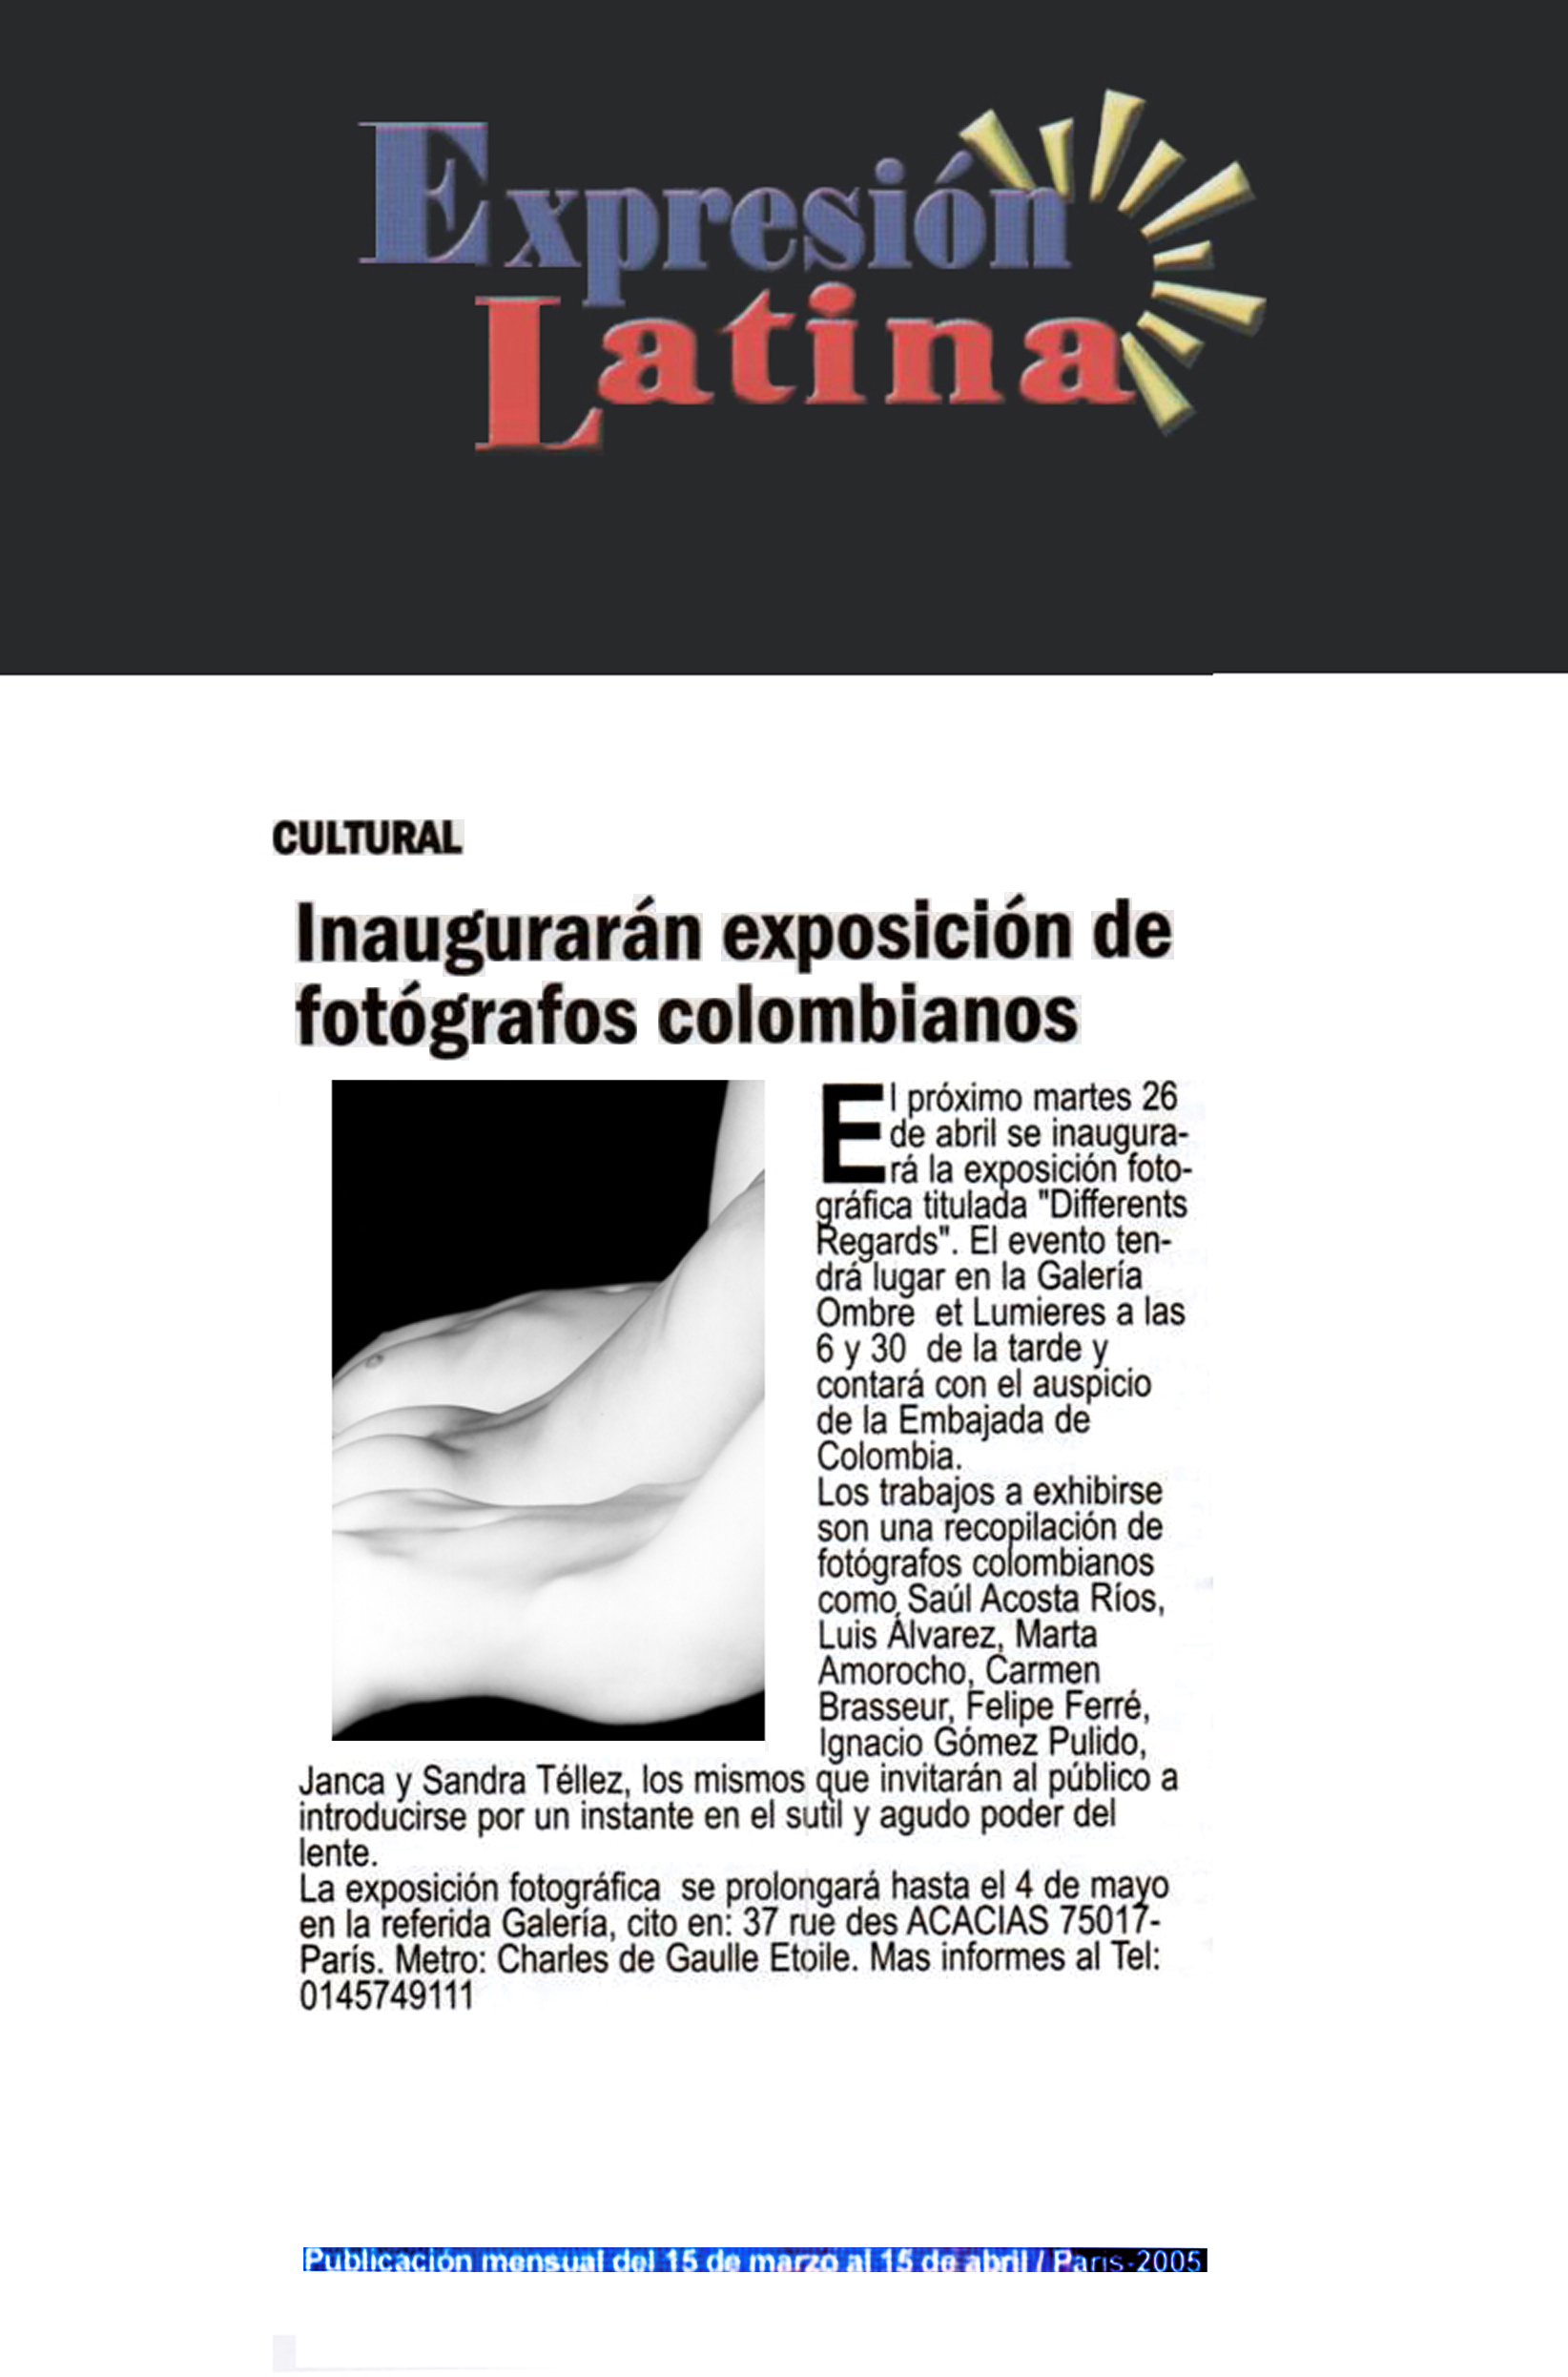 FR - EXPRESION LATINA mai 2005.jpg